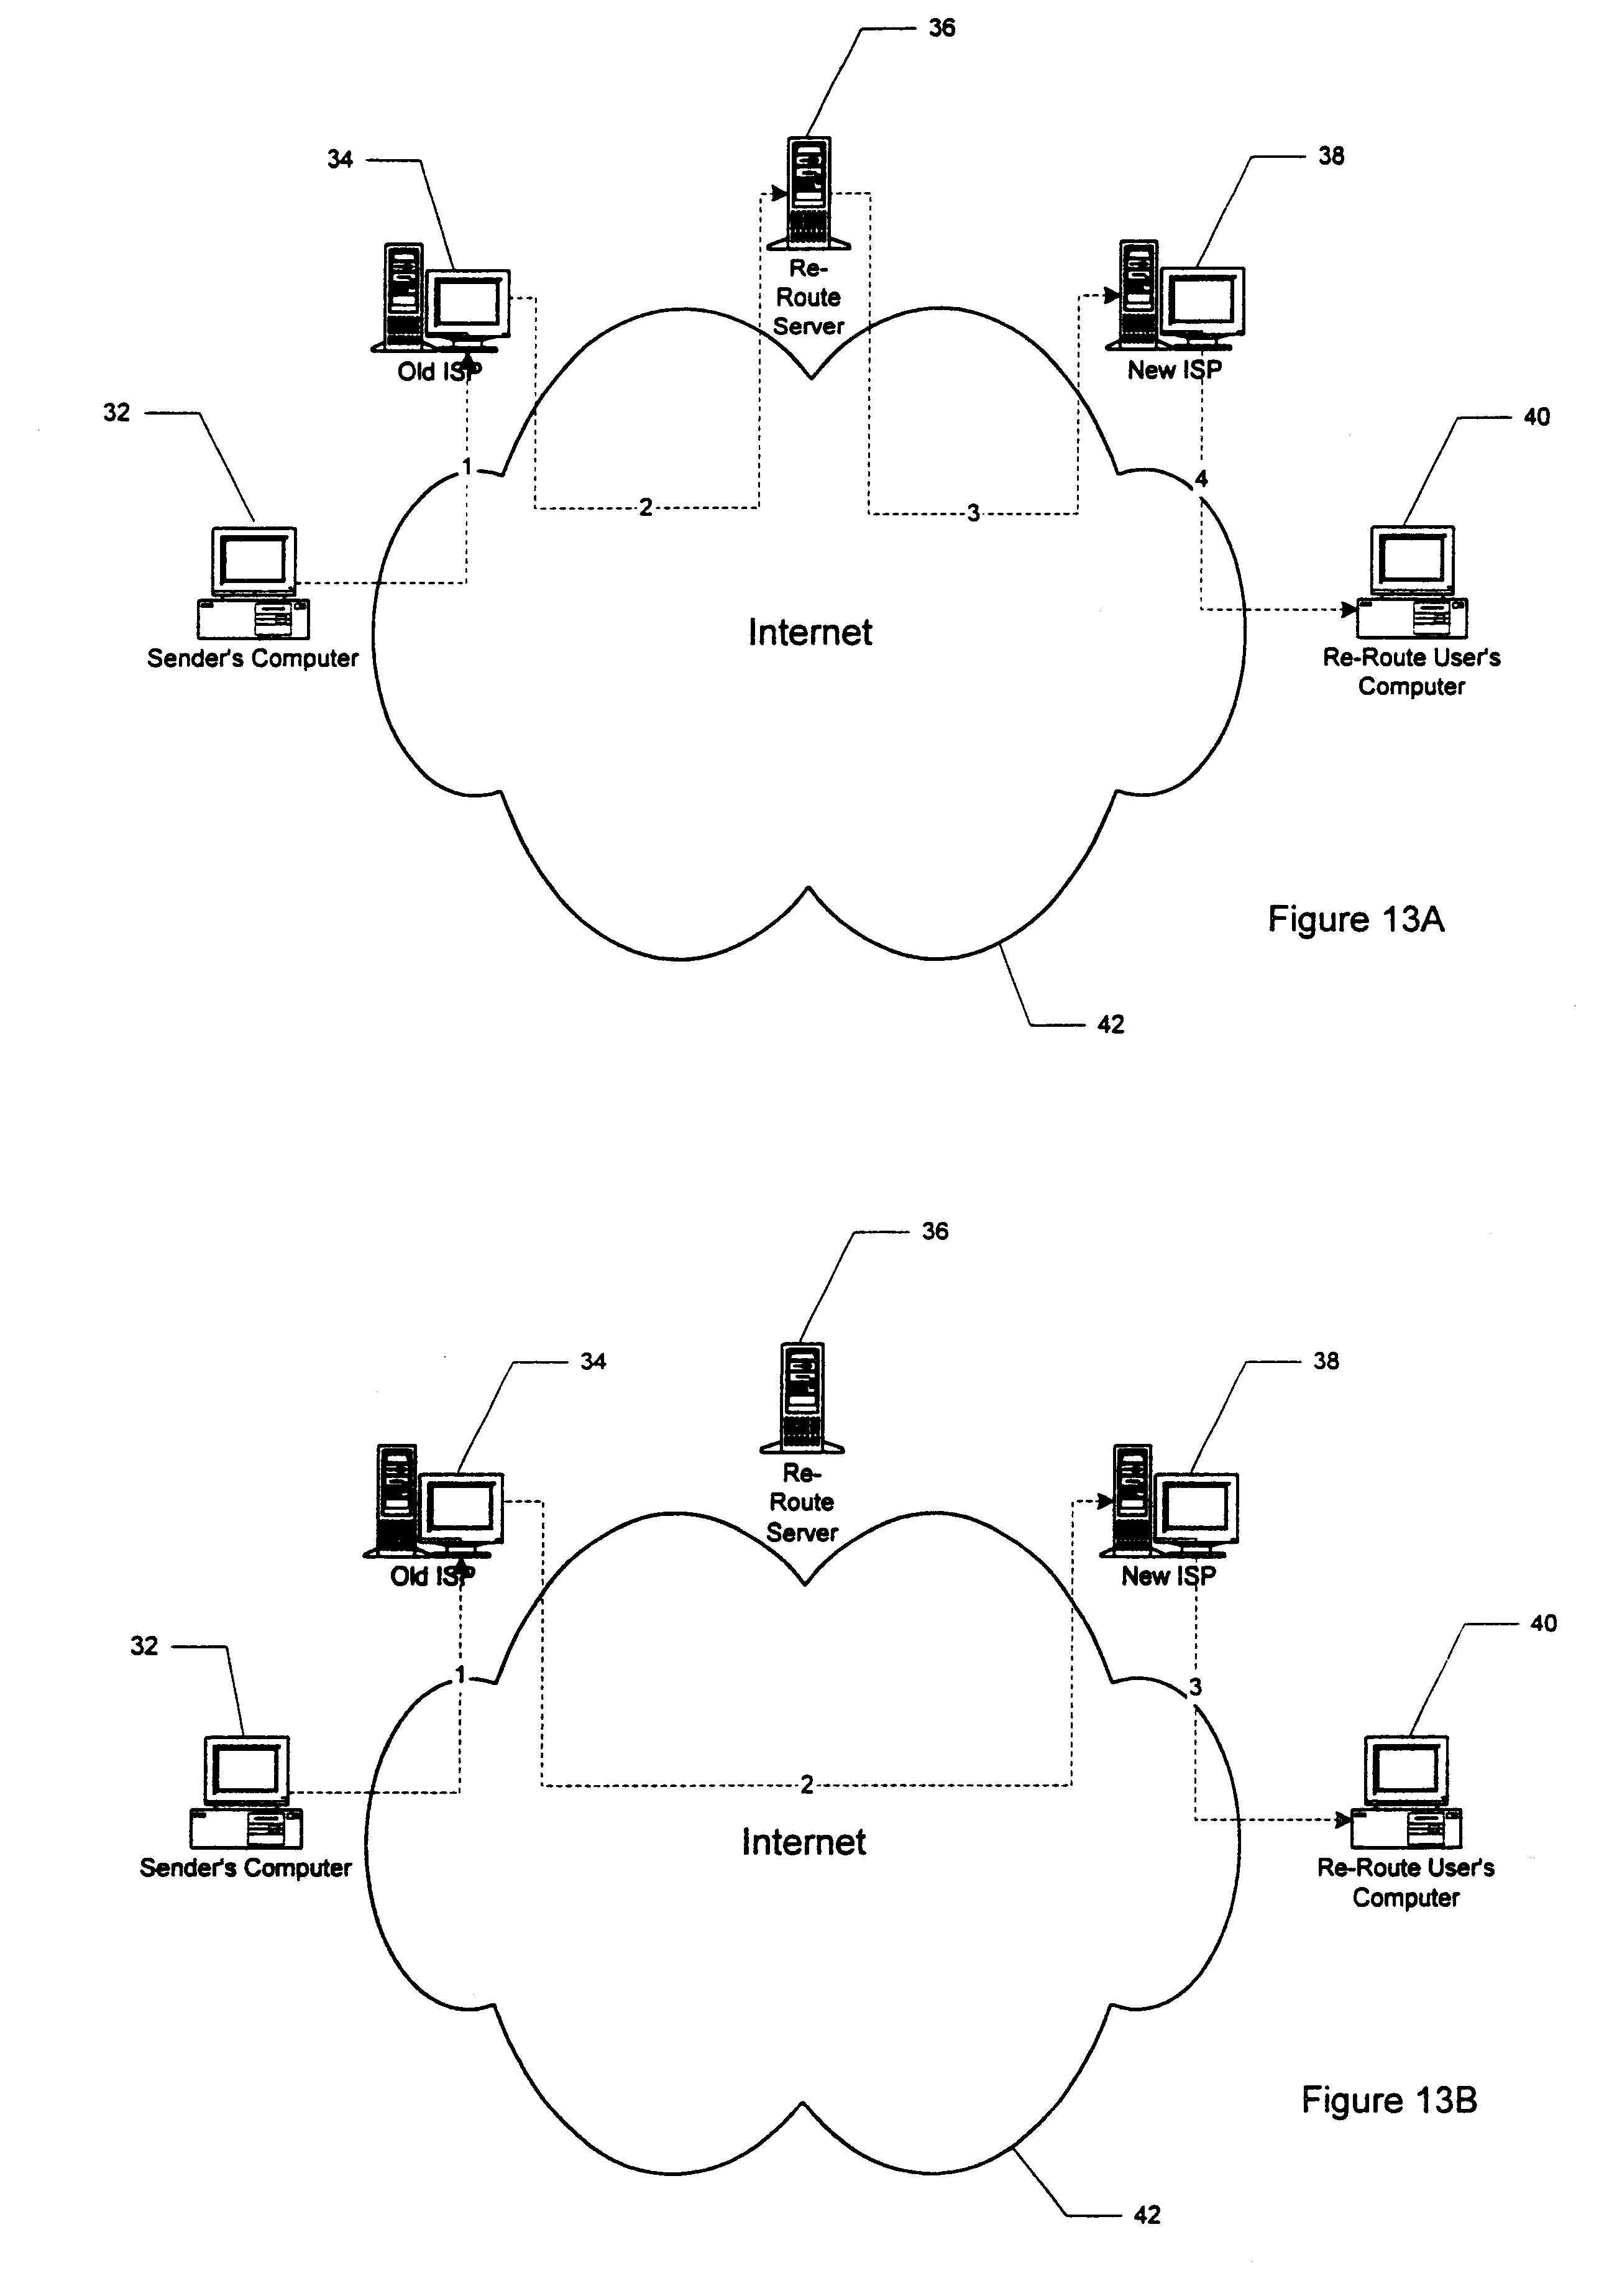 Patent US 6,438,583 B1